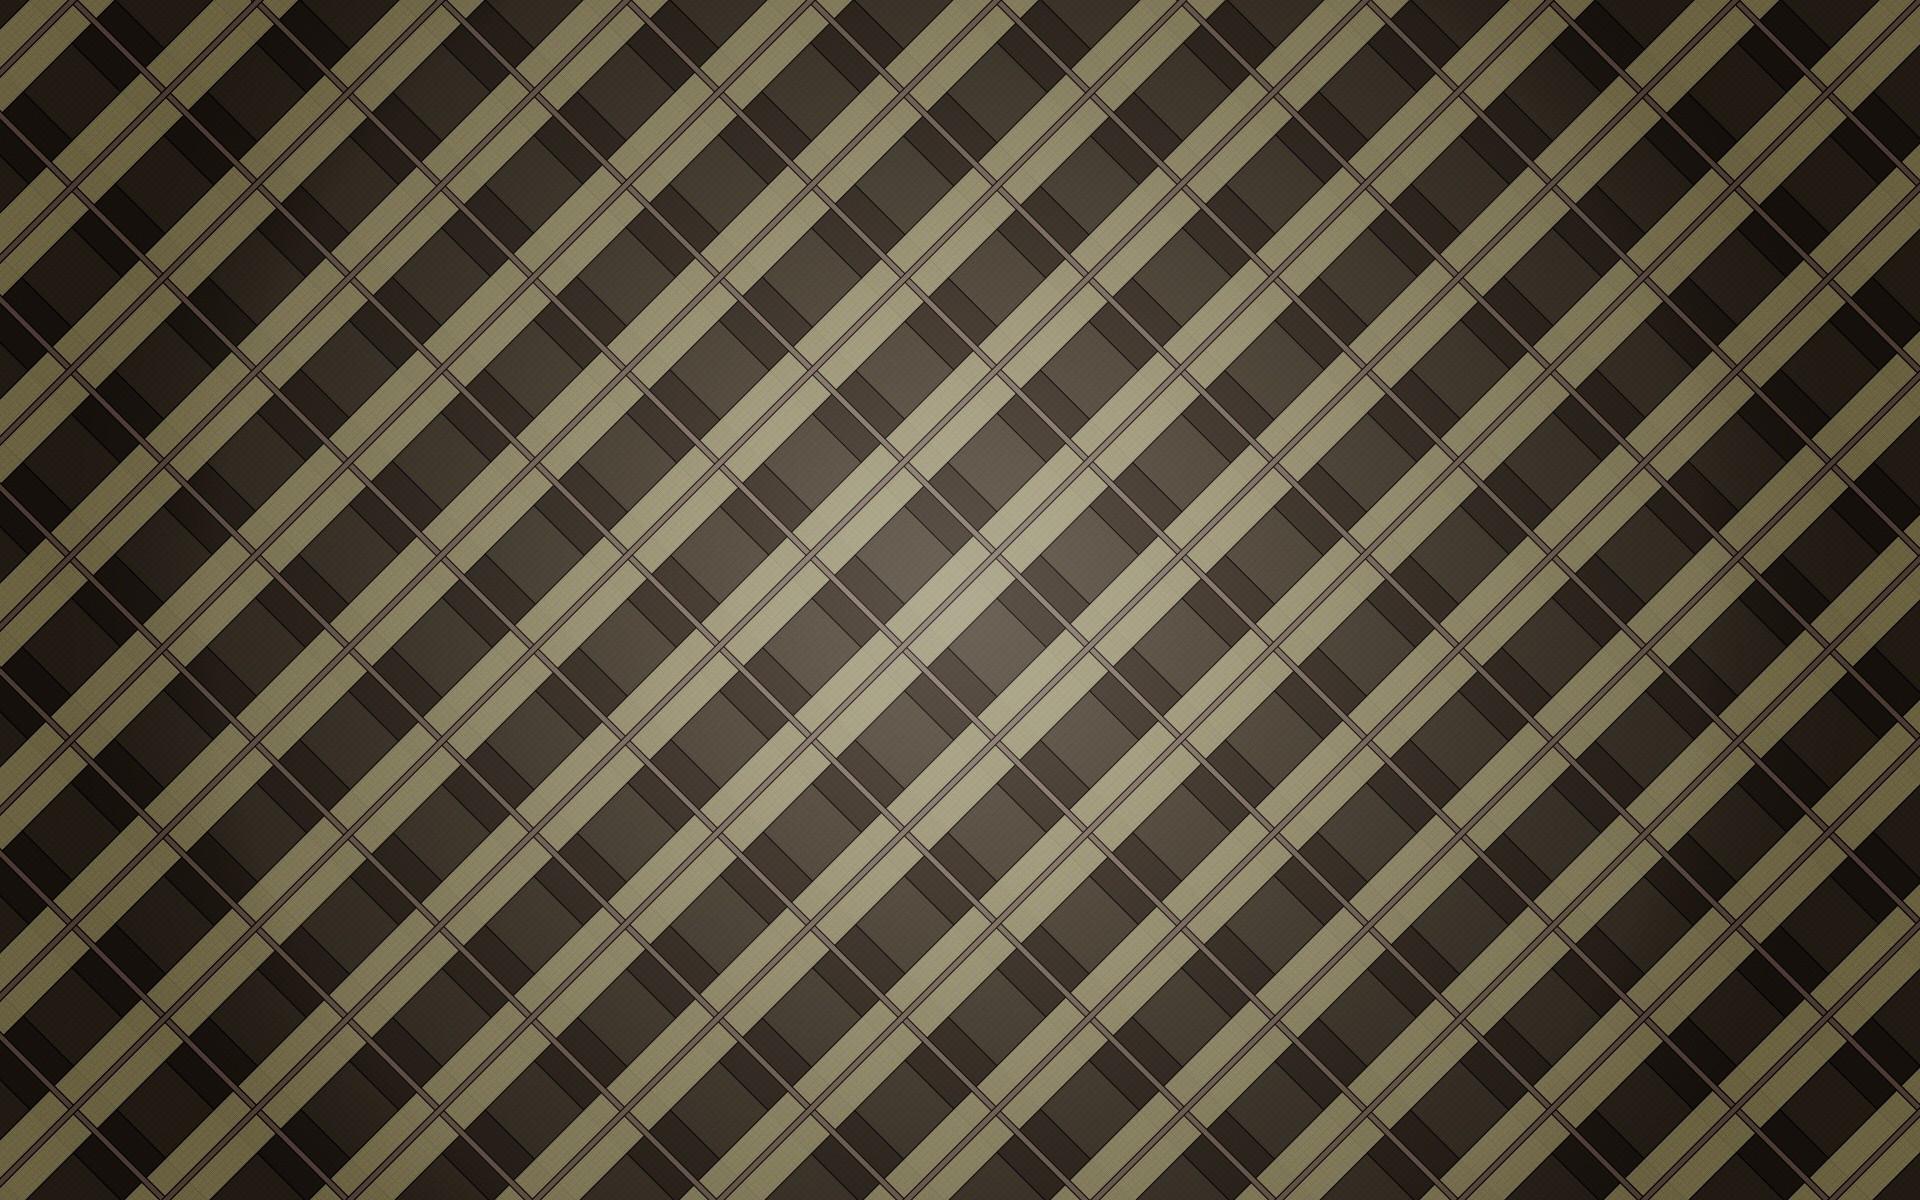 fabric plaid wallpaper hd - photo #2